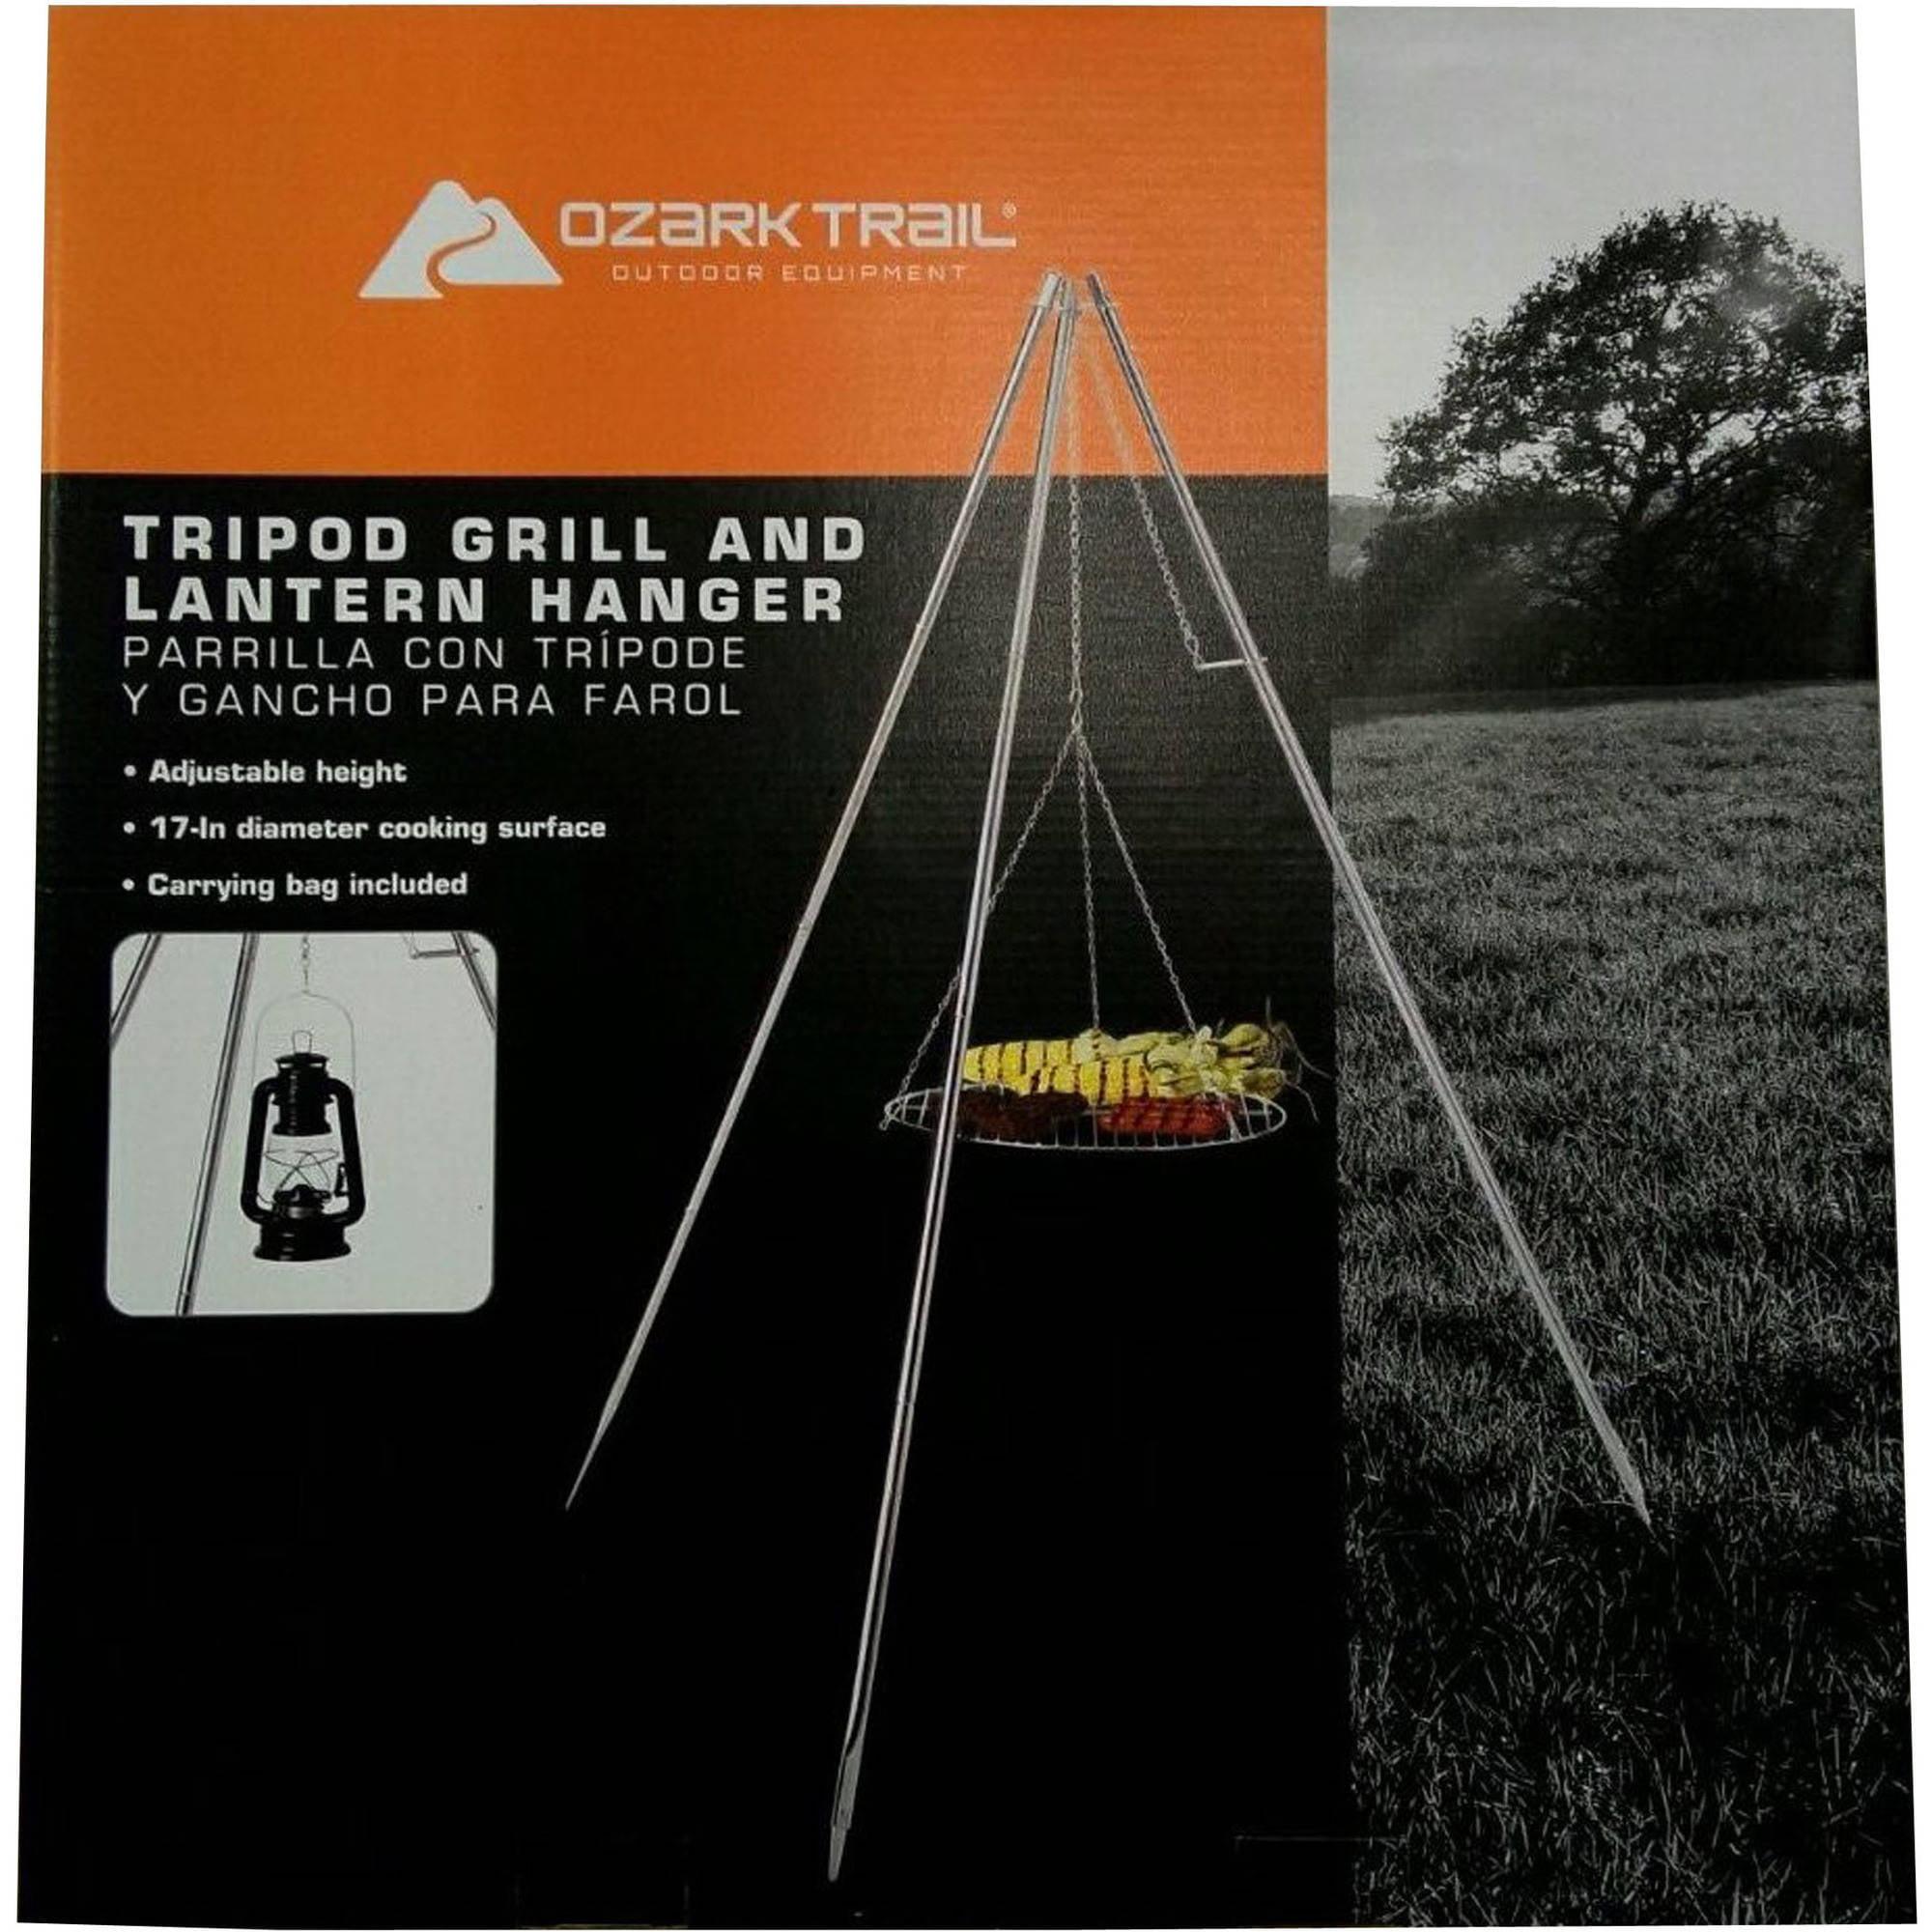 Tripod Grill with Lantern Hanger